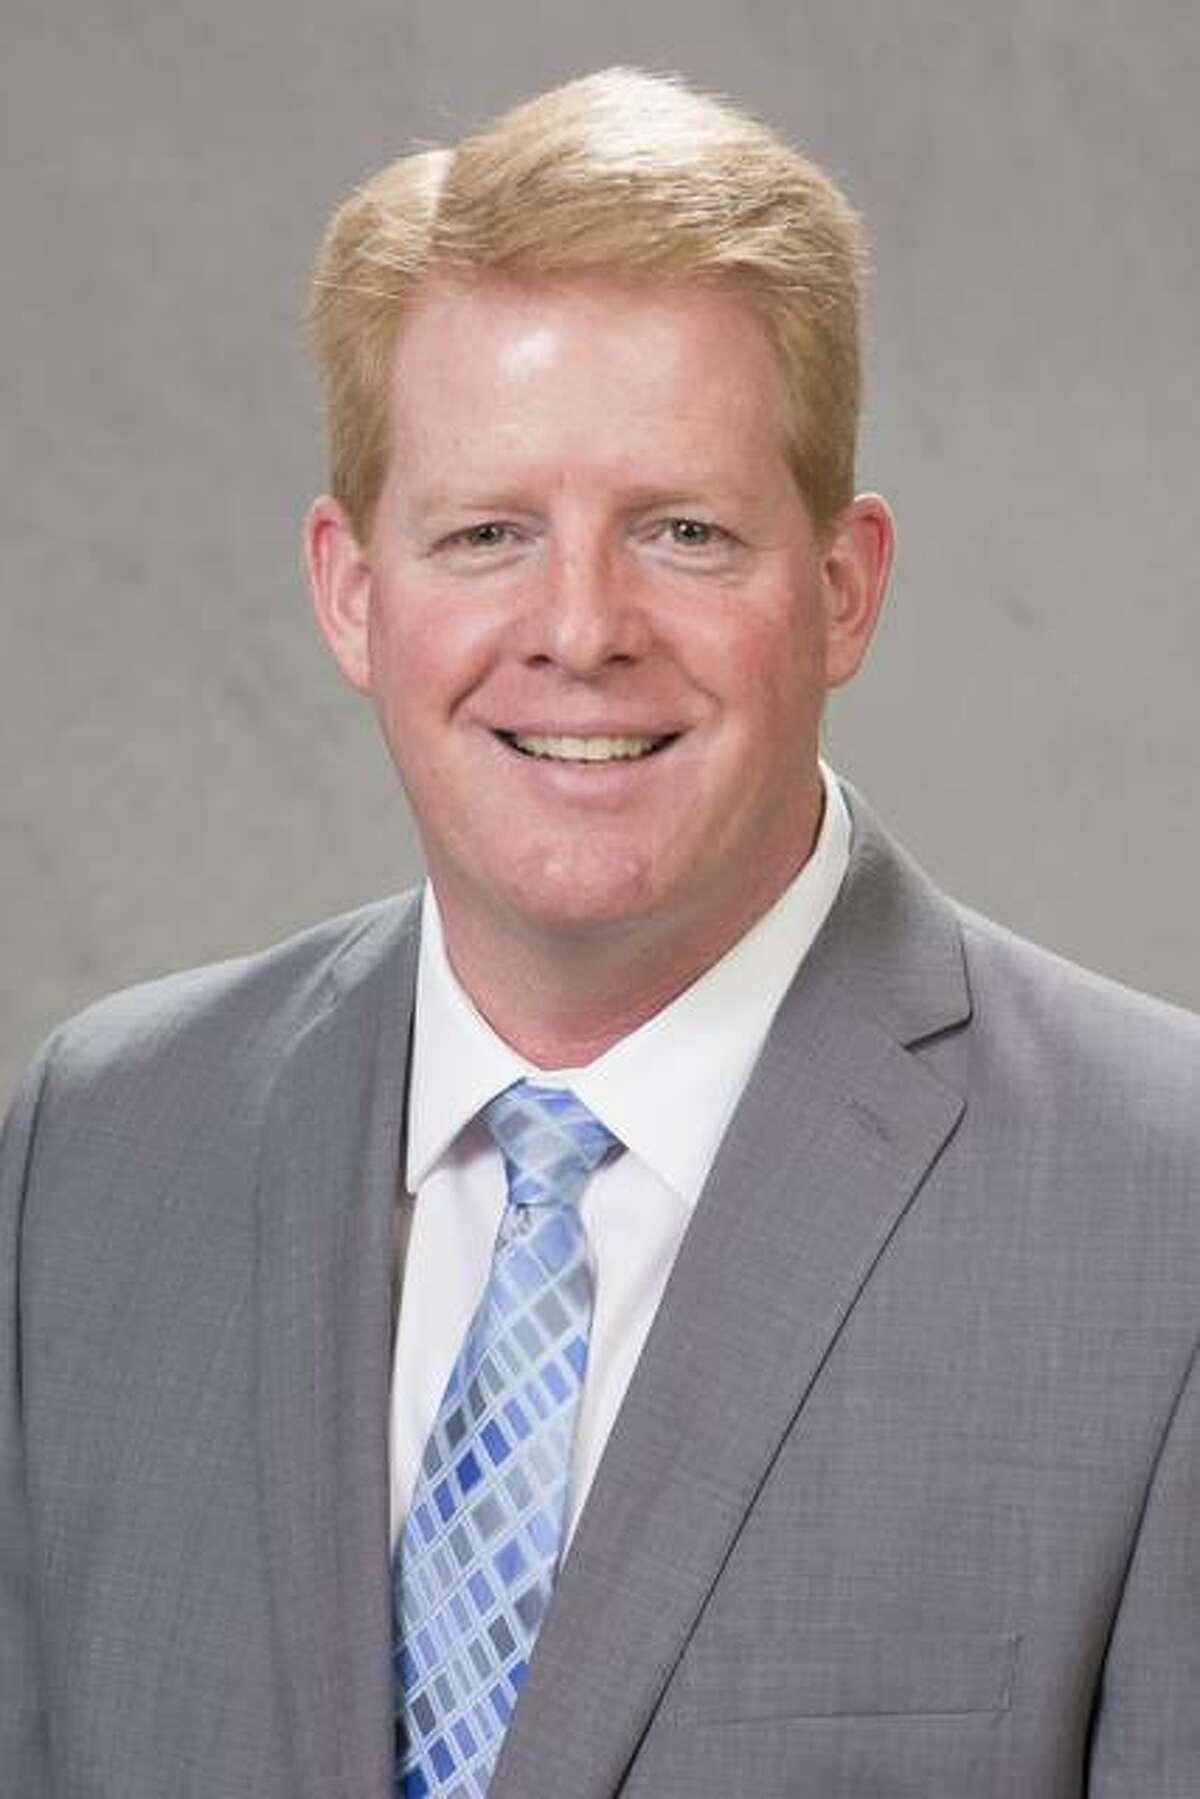 OSF HealthCare's Randy Billings, senior vice president of population health